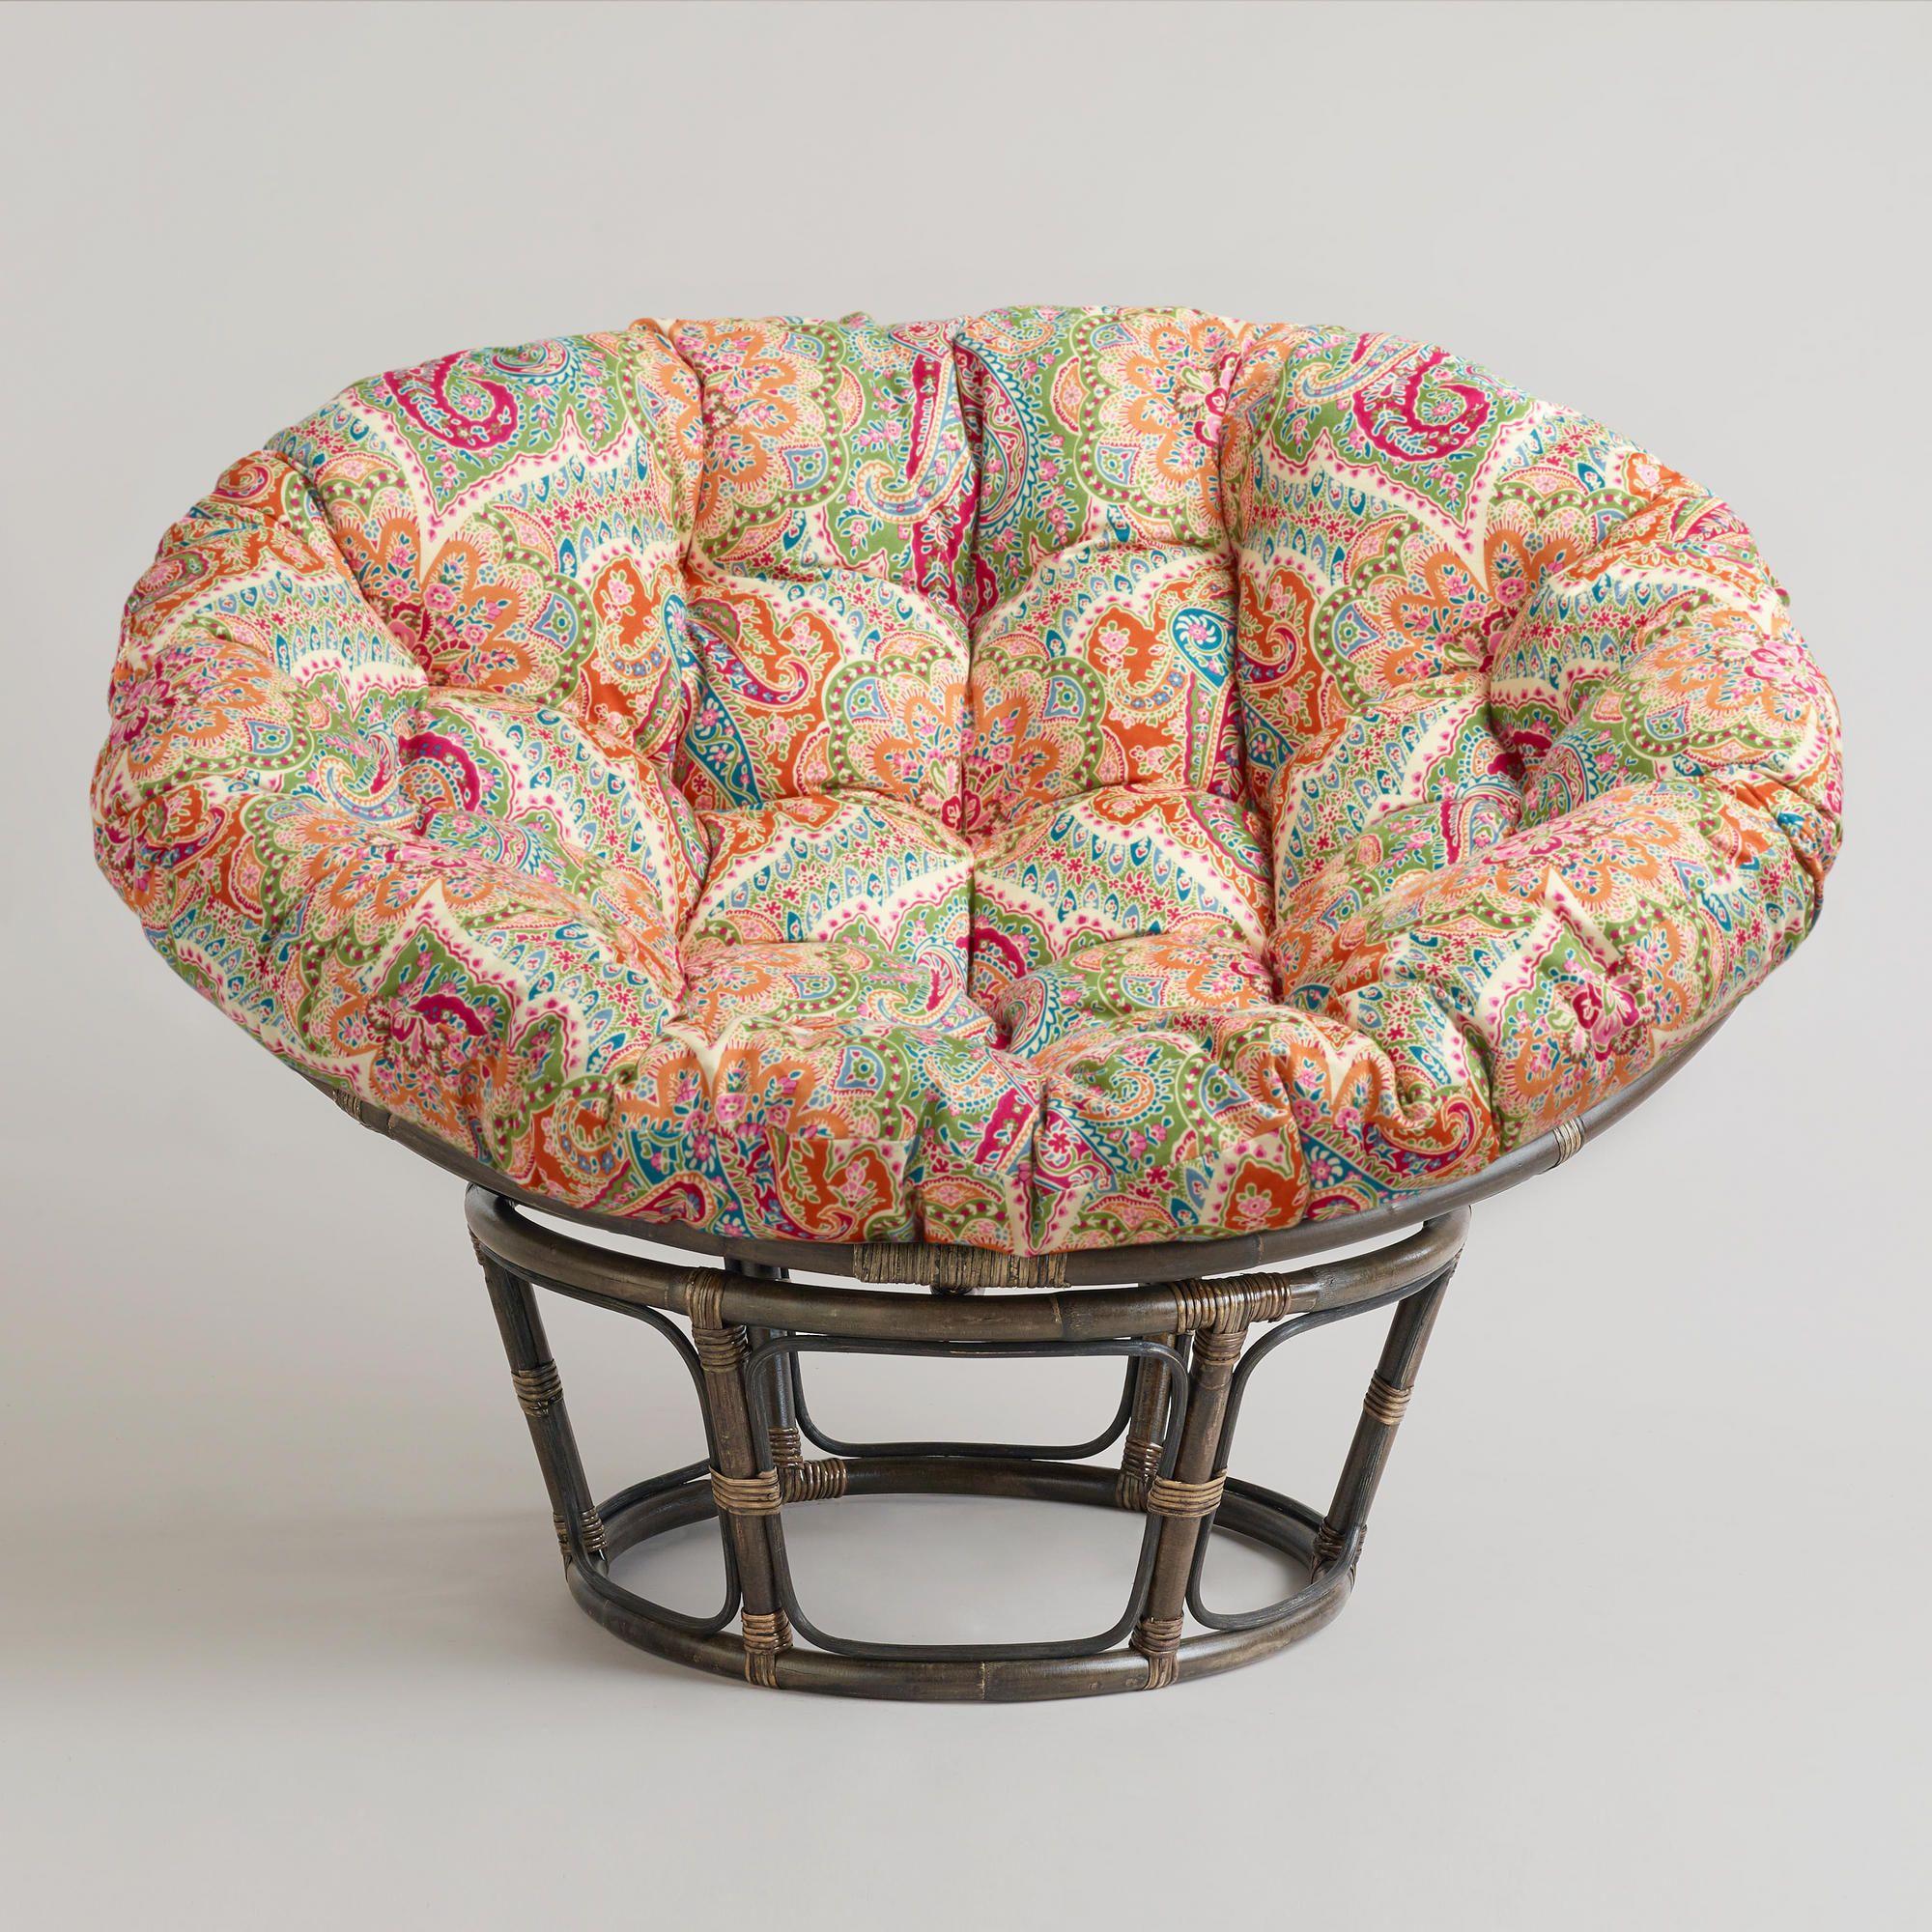 Venice Papasan Chair Cushion World Market Papasan Chair Cushion Papasan Chair Wicker Chair Cushions